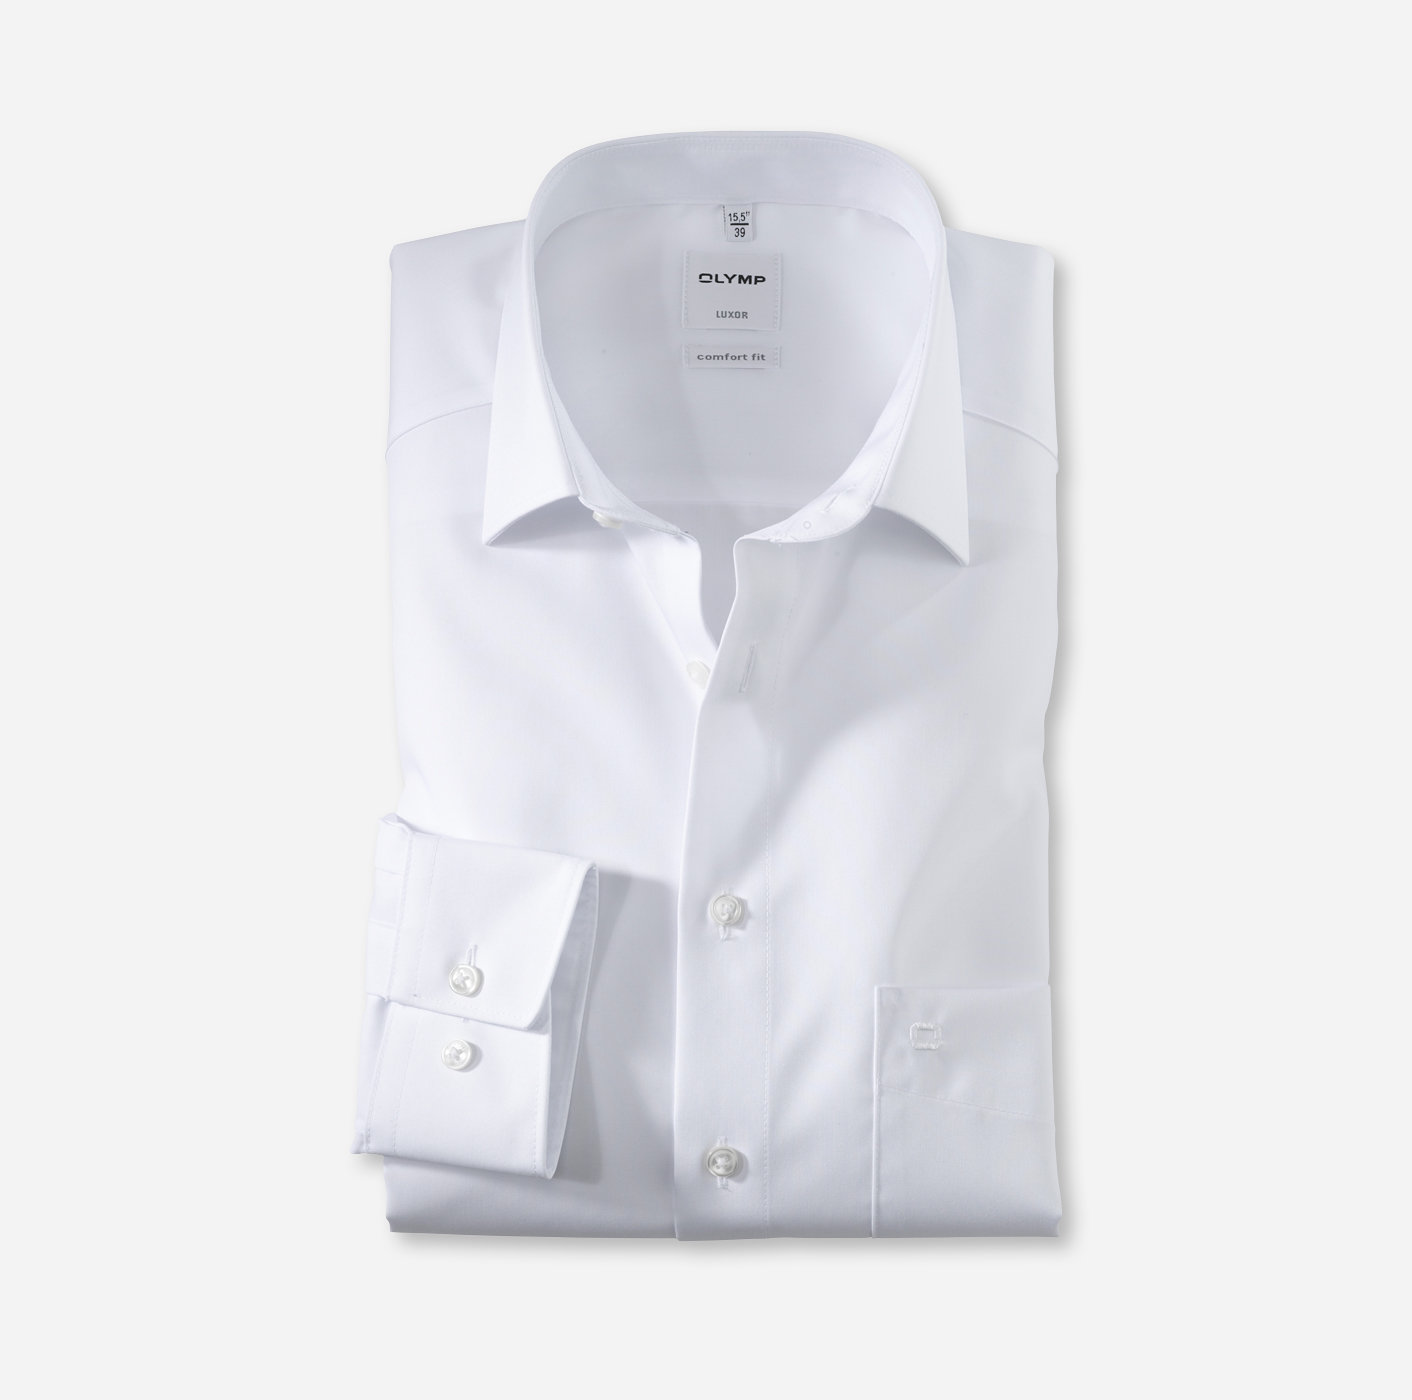 Oberhemd Luxor, 1/1 Arm, weiß, comfort fit